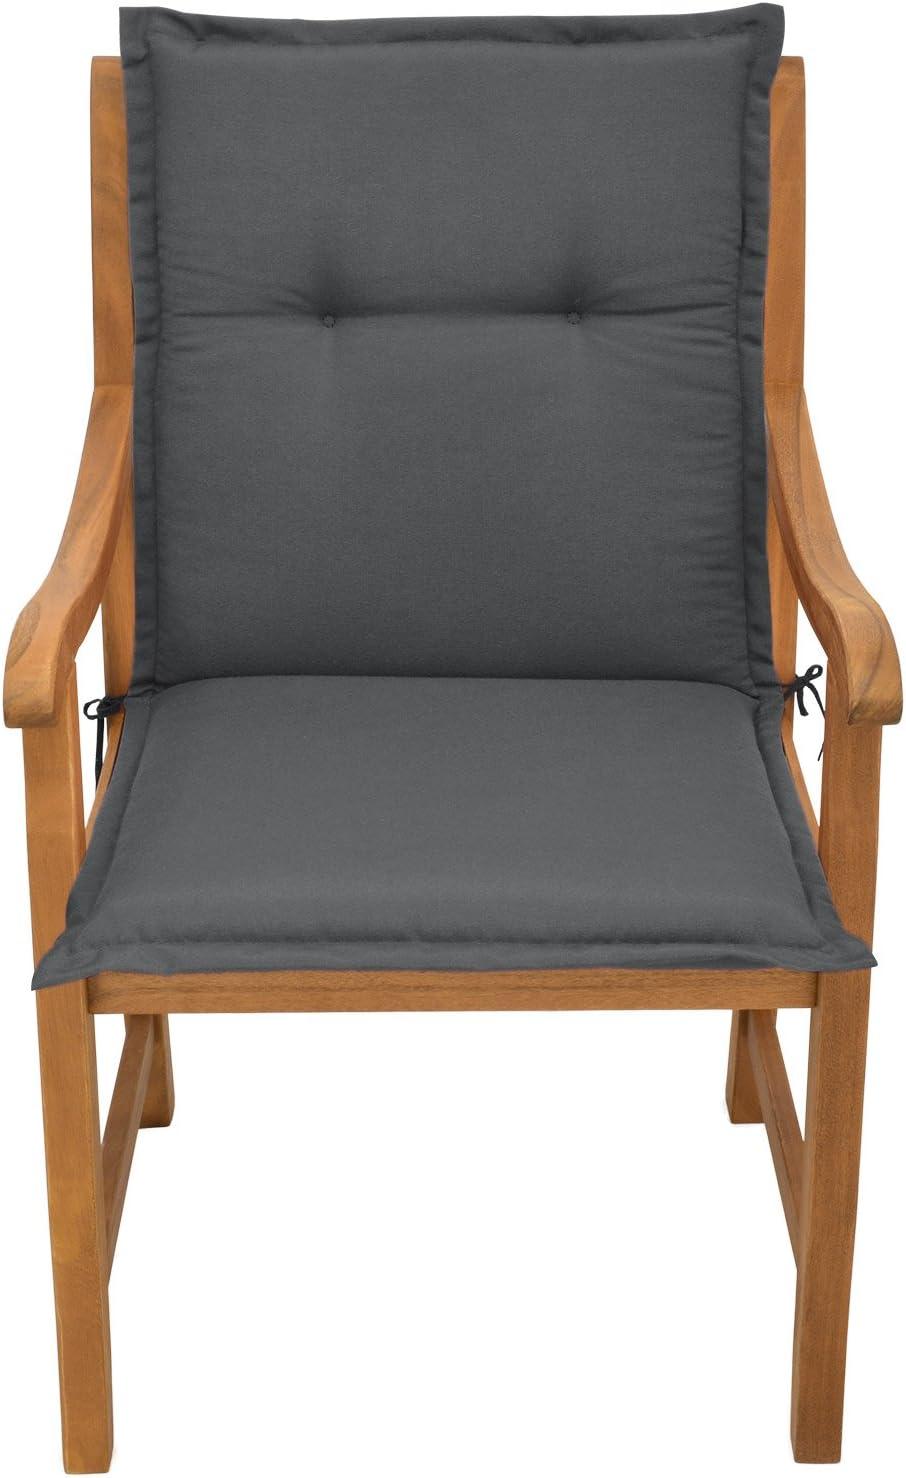 Placas compactas de gomaespuma Natural Coj/ín para sillas de balc/ón o Asiento Exterior con Respaldo Bajo Beautissu Loft NL 100x50x6 cm